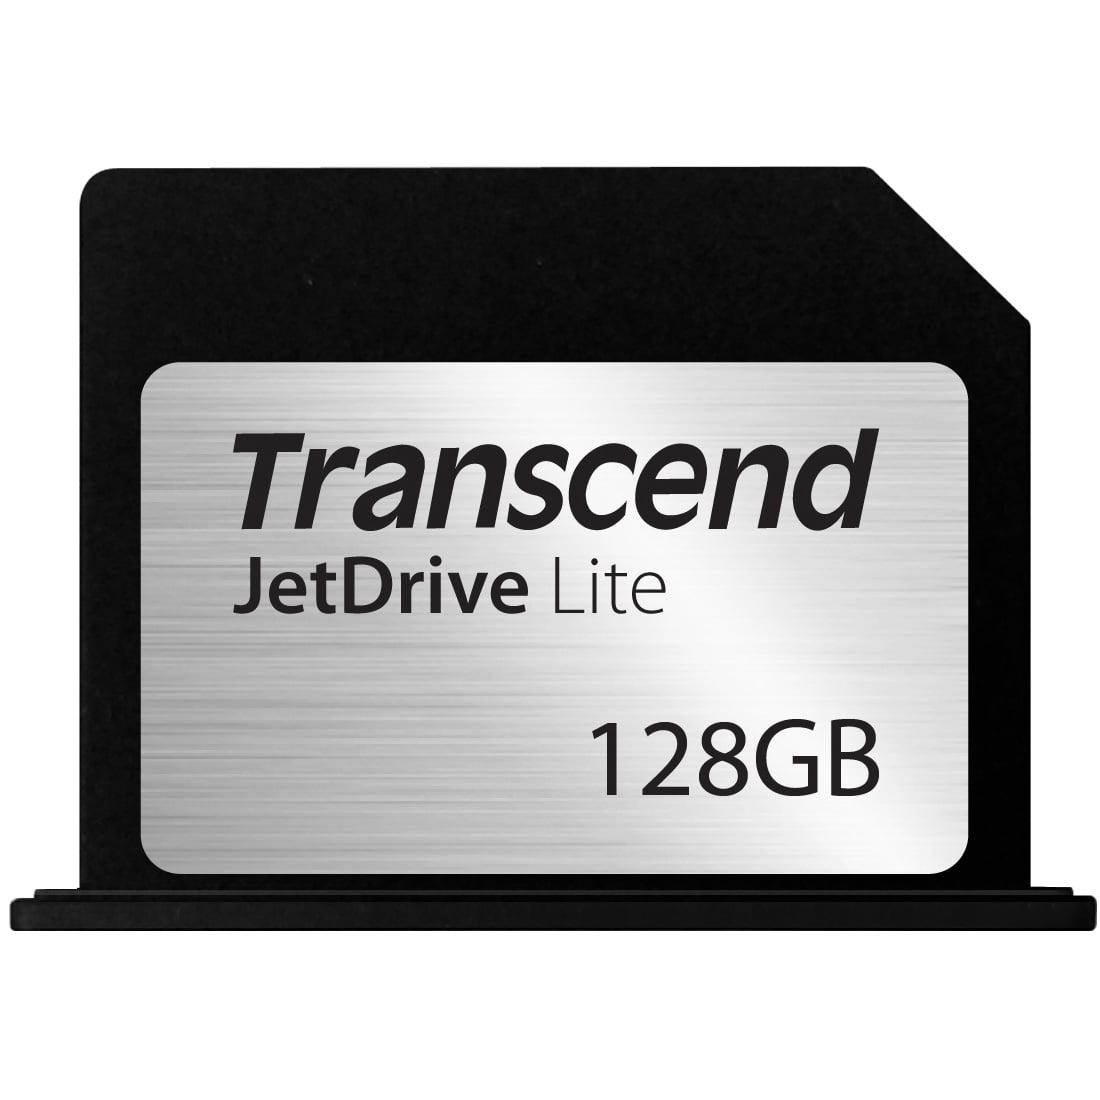 Transcend TS128GJDL360 128GB JetDrive Lite 360 Expansion Card